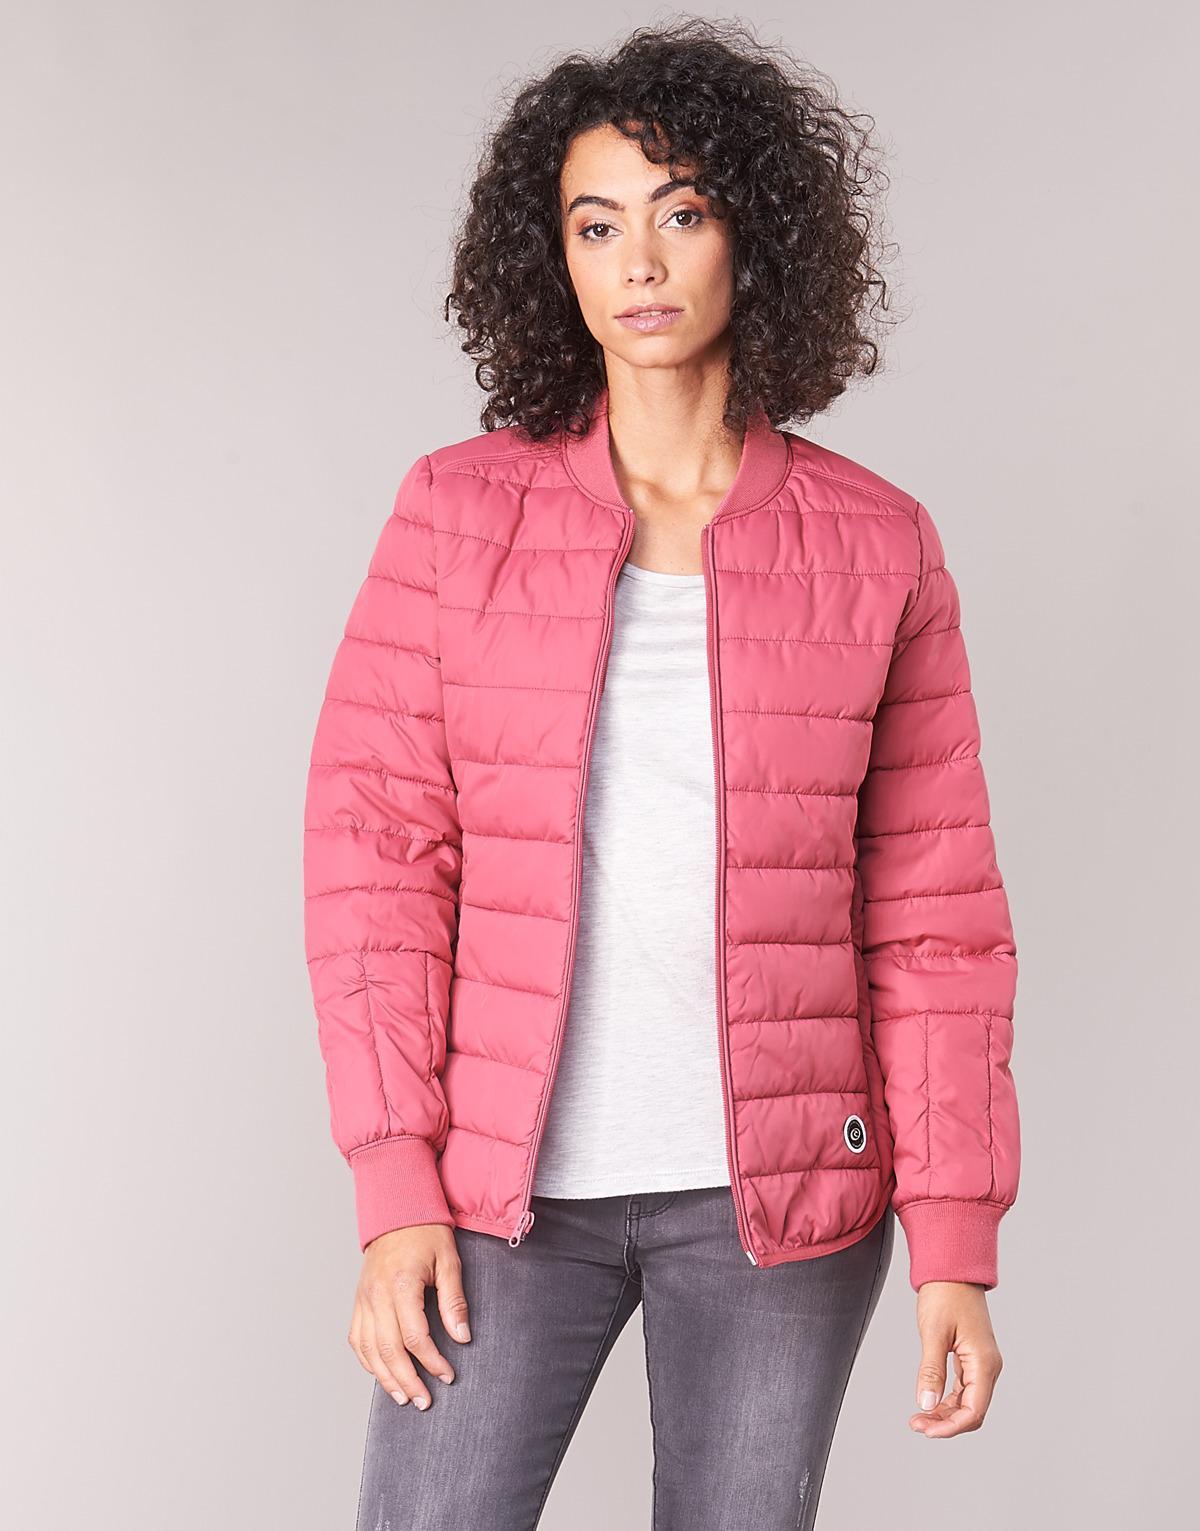 Autumn Vibe Jacket Women's Jacket In Pink